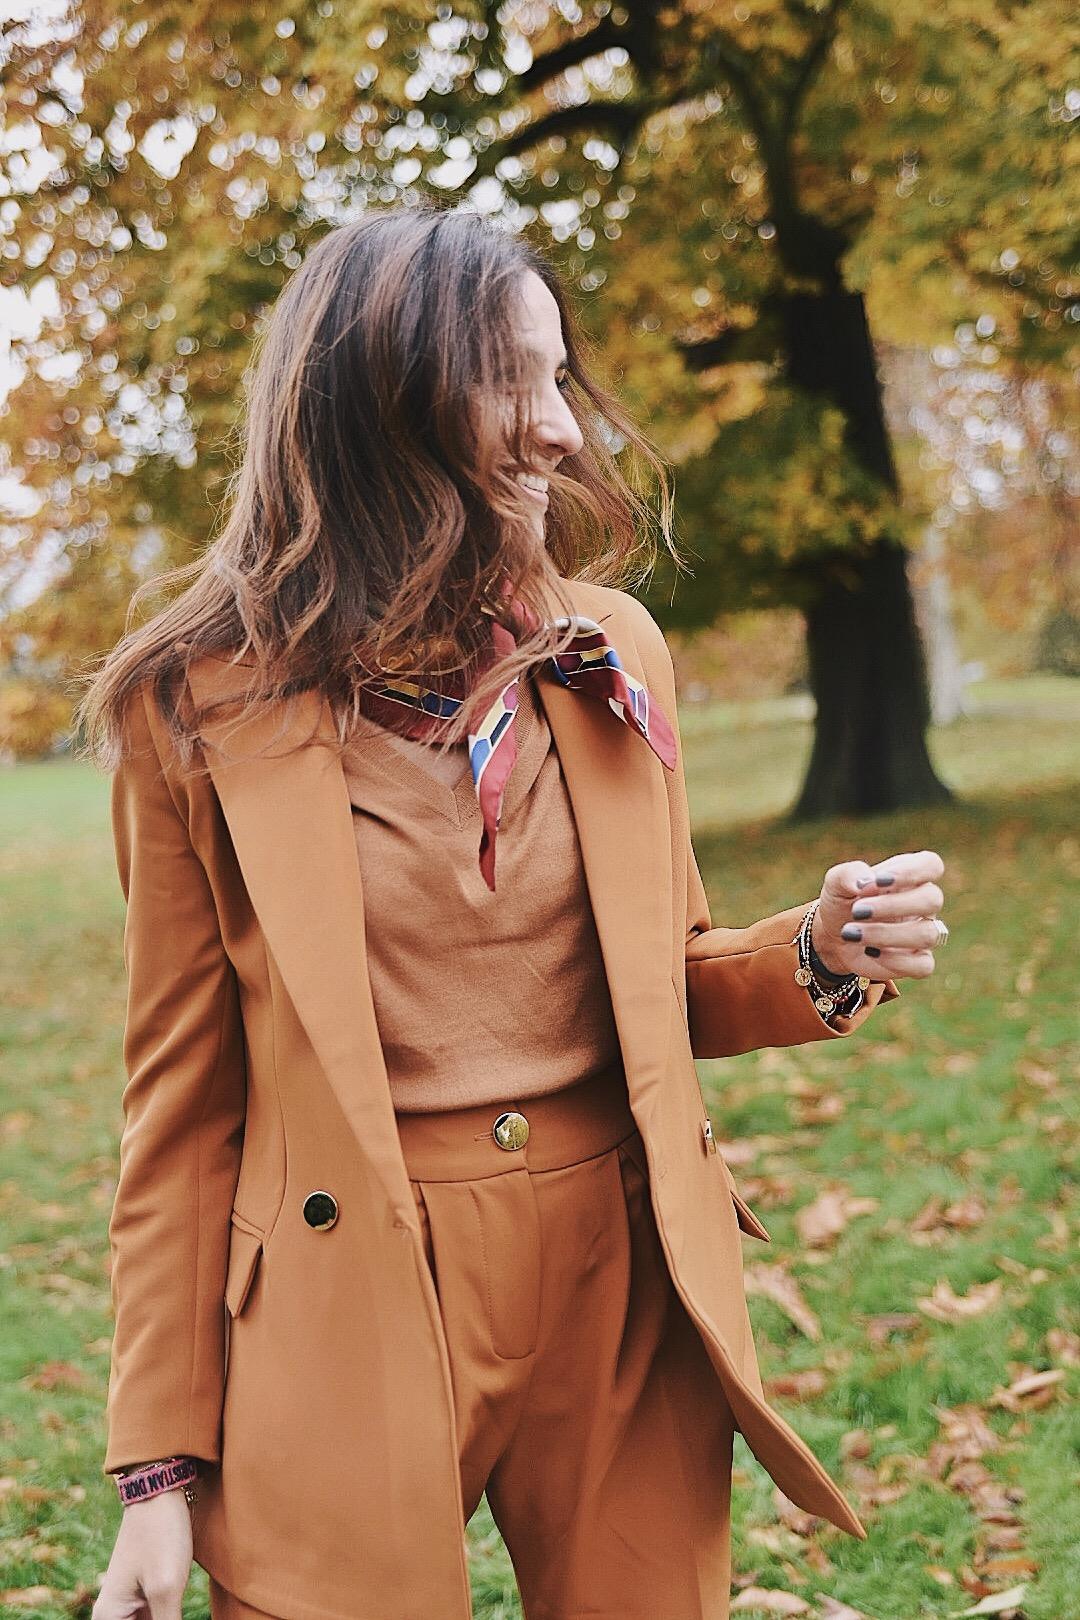 el_blog_de_silvia_Traje_Chaqueta_Pintini_Fashion_Travel_Blogger_Influencer